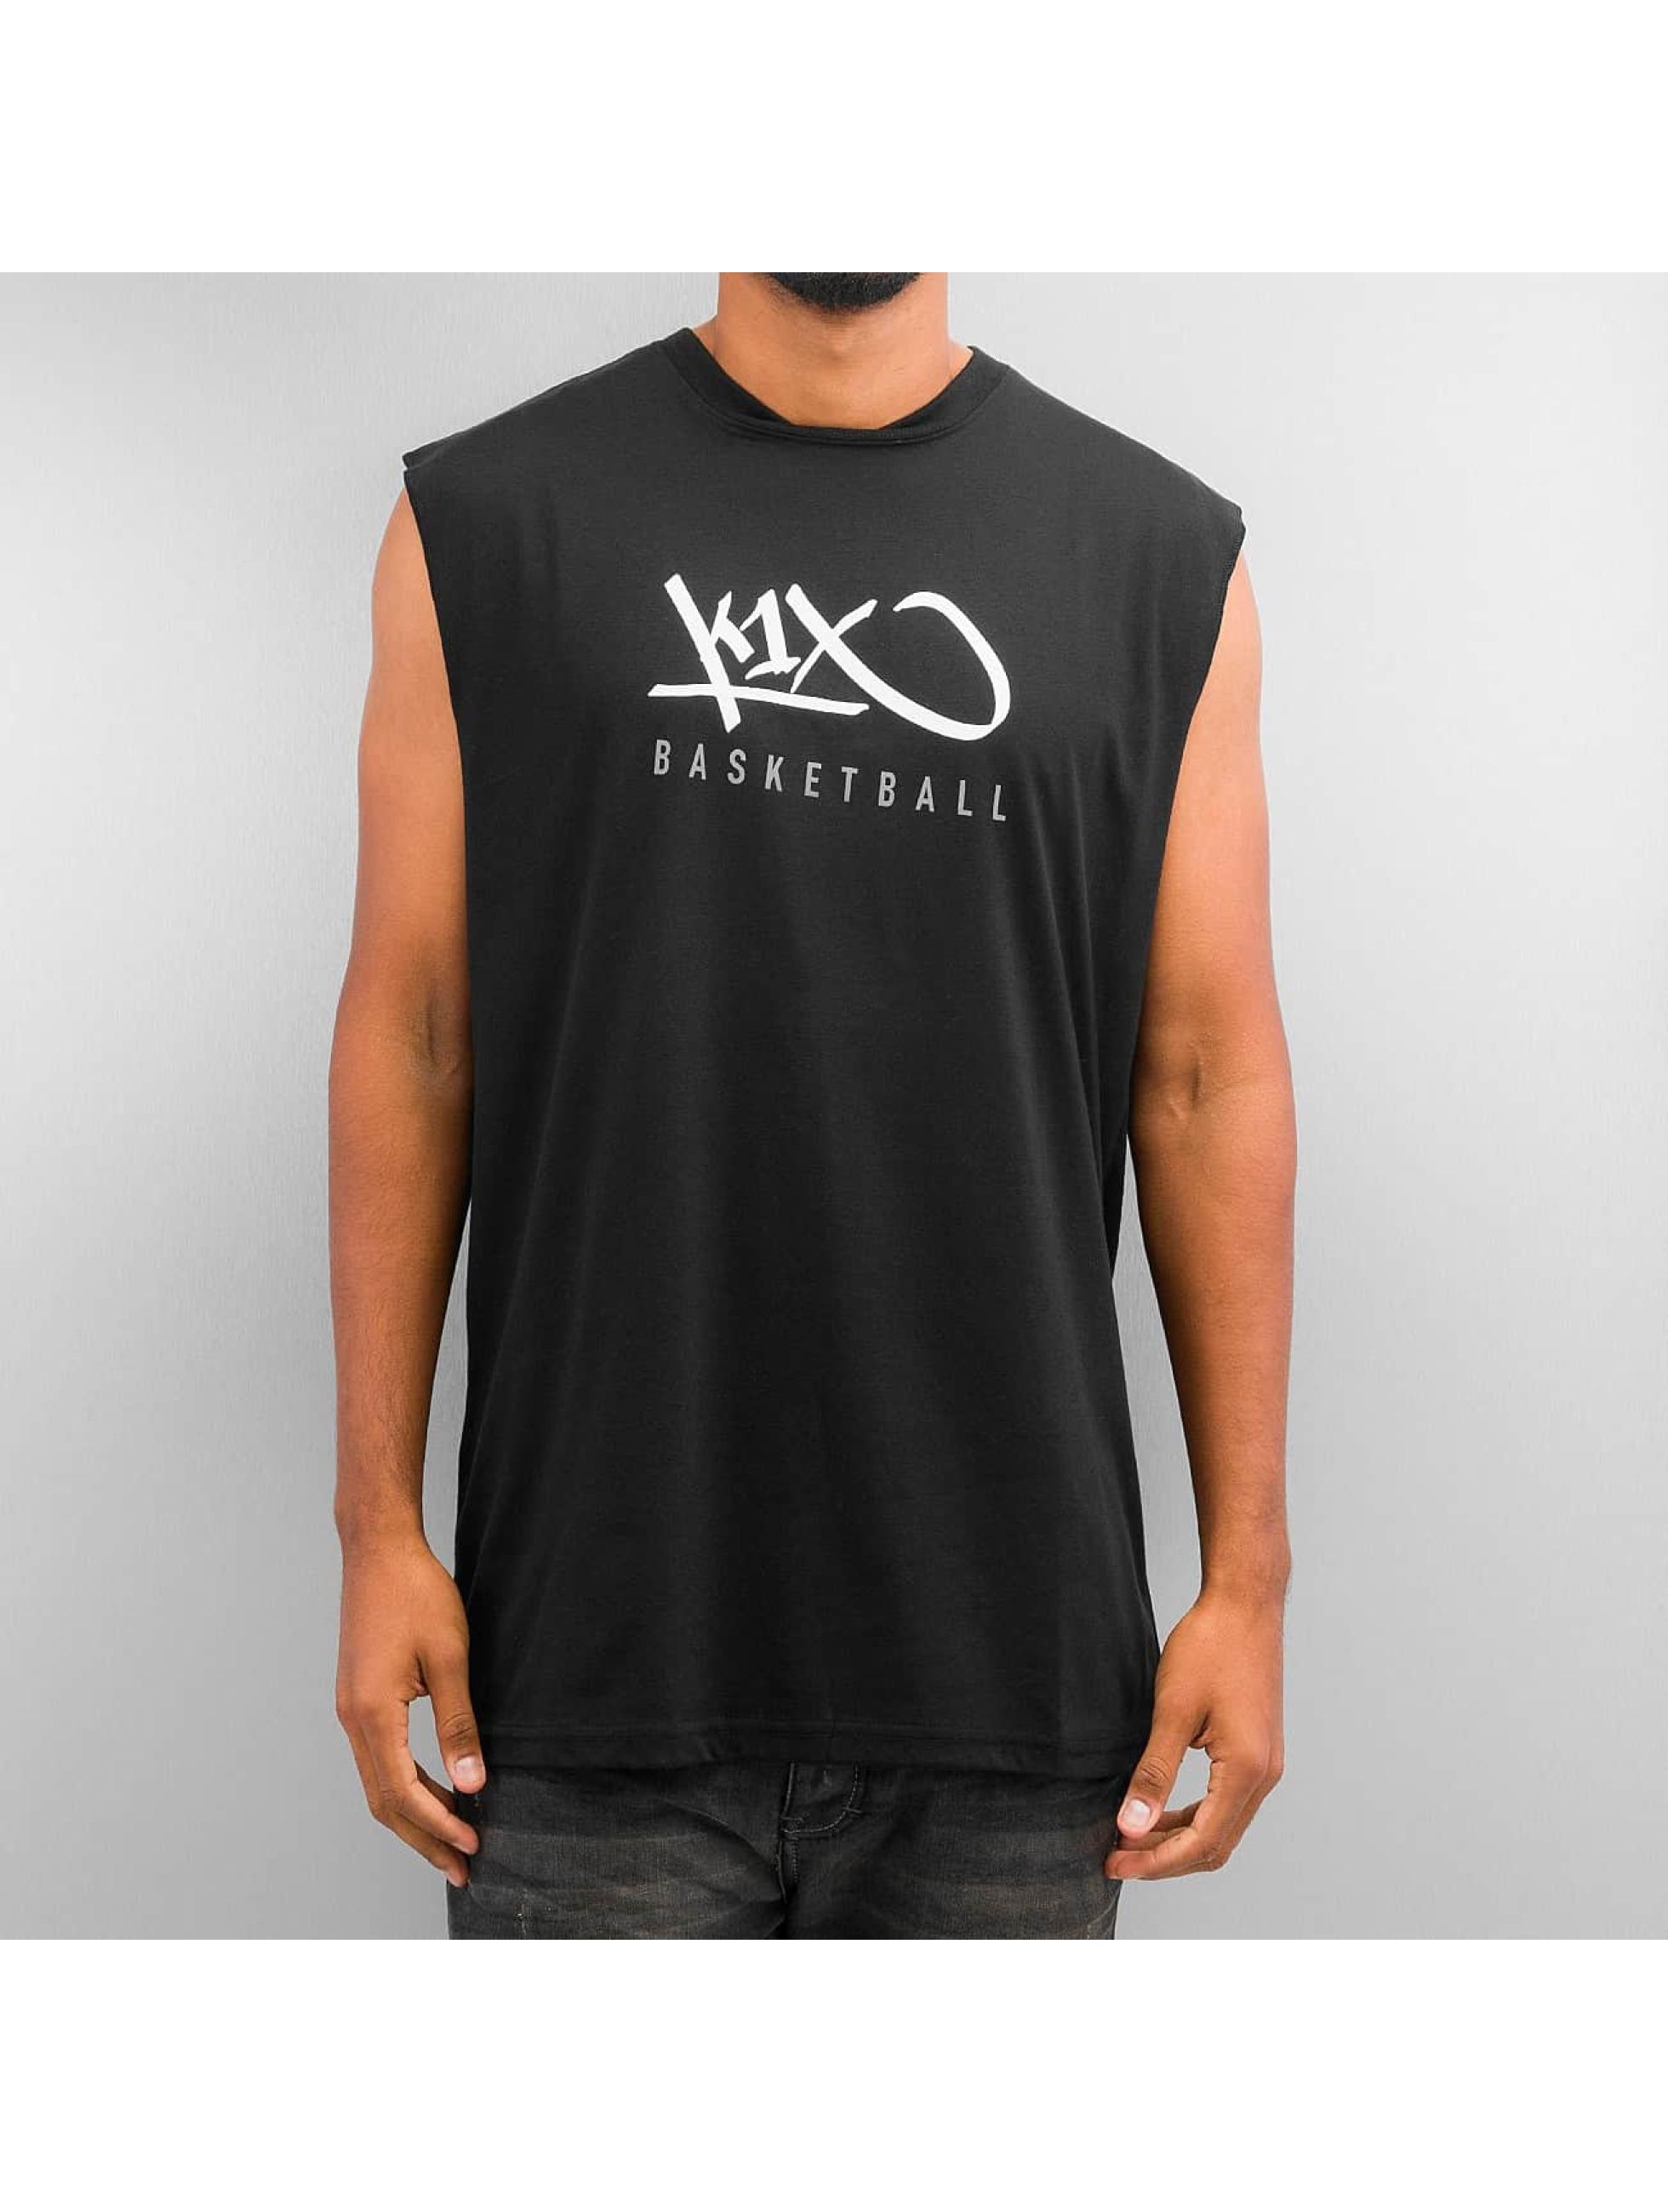 K1X Haut / Débardeurs Hardwood Sleeveless en noir